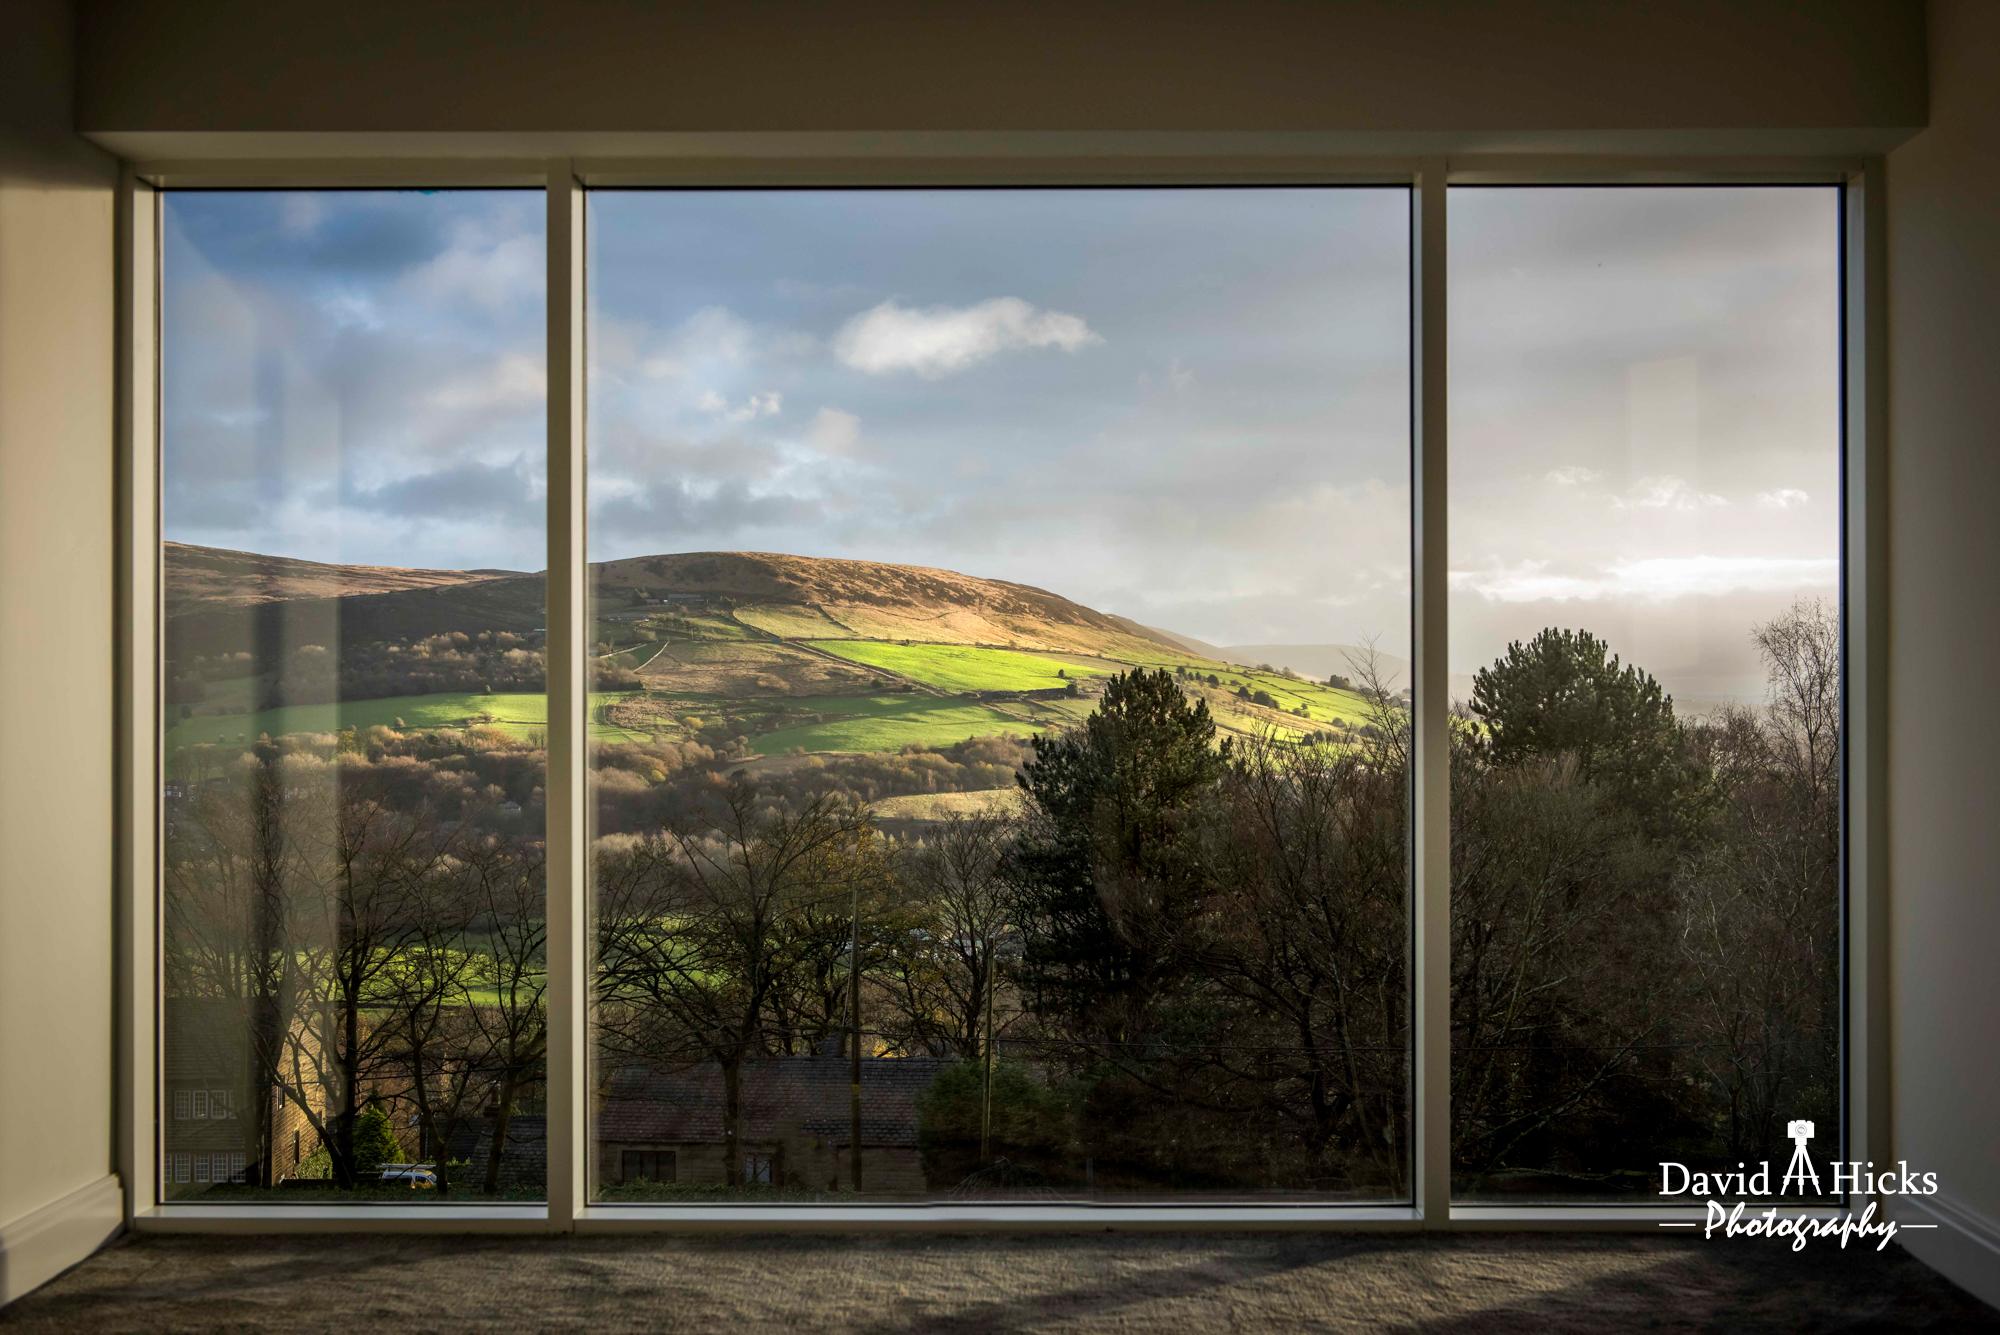 David A Hicks Property Photography